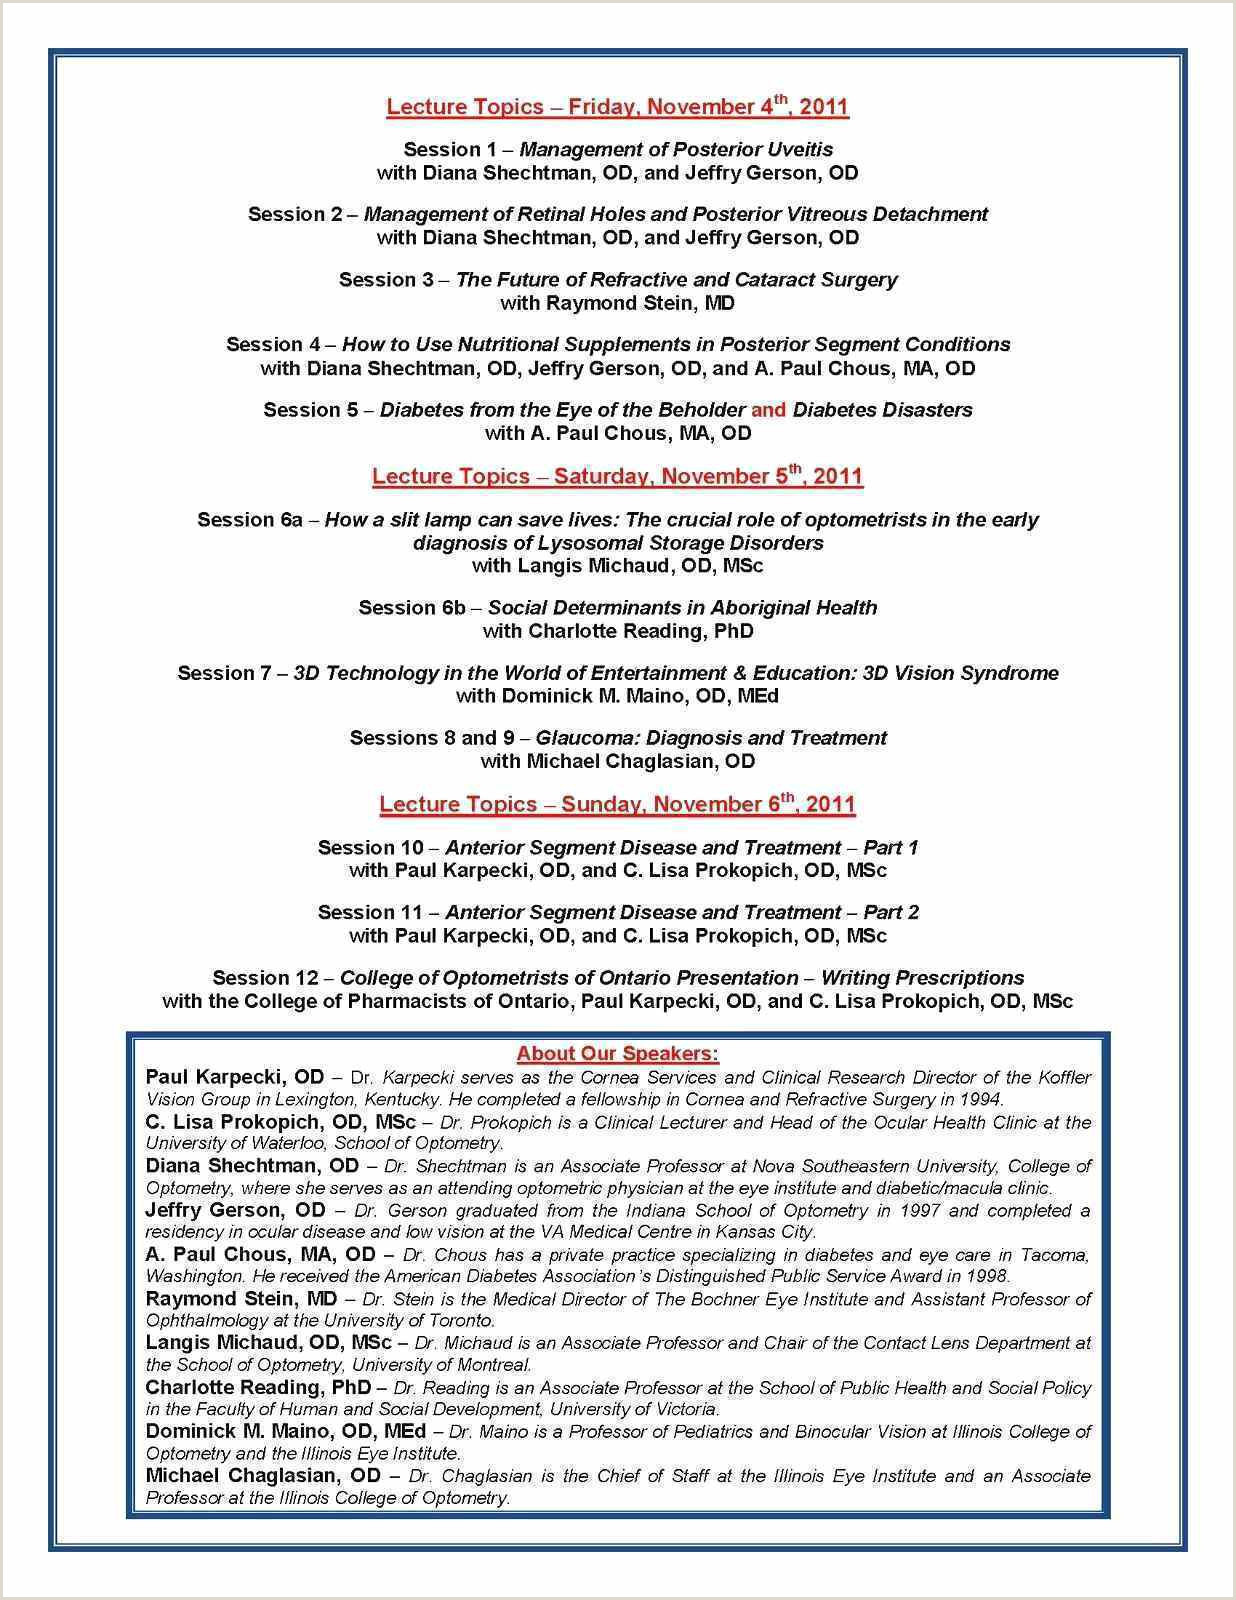 Resume Format For Job Latest Cv Gestion Administration échantillon Fresh Latest Cv